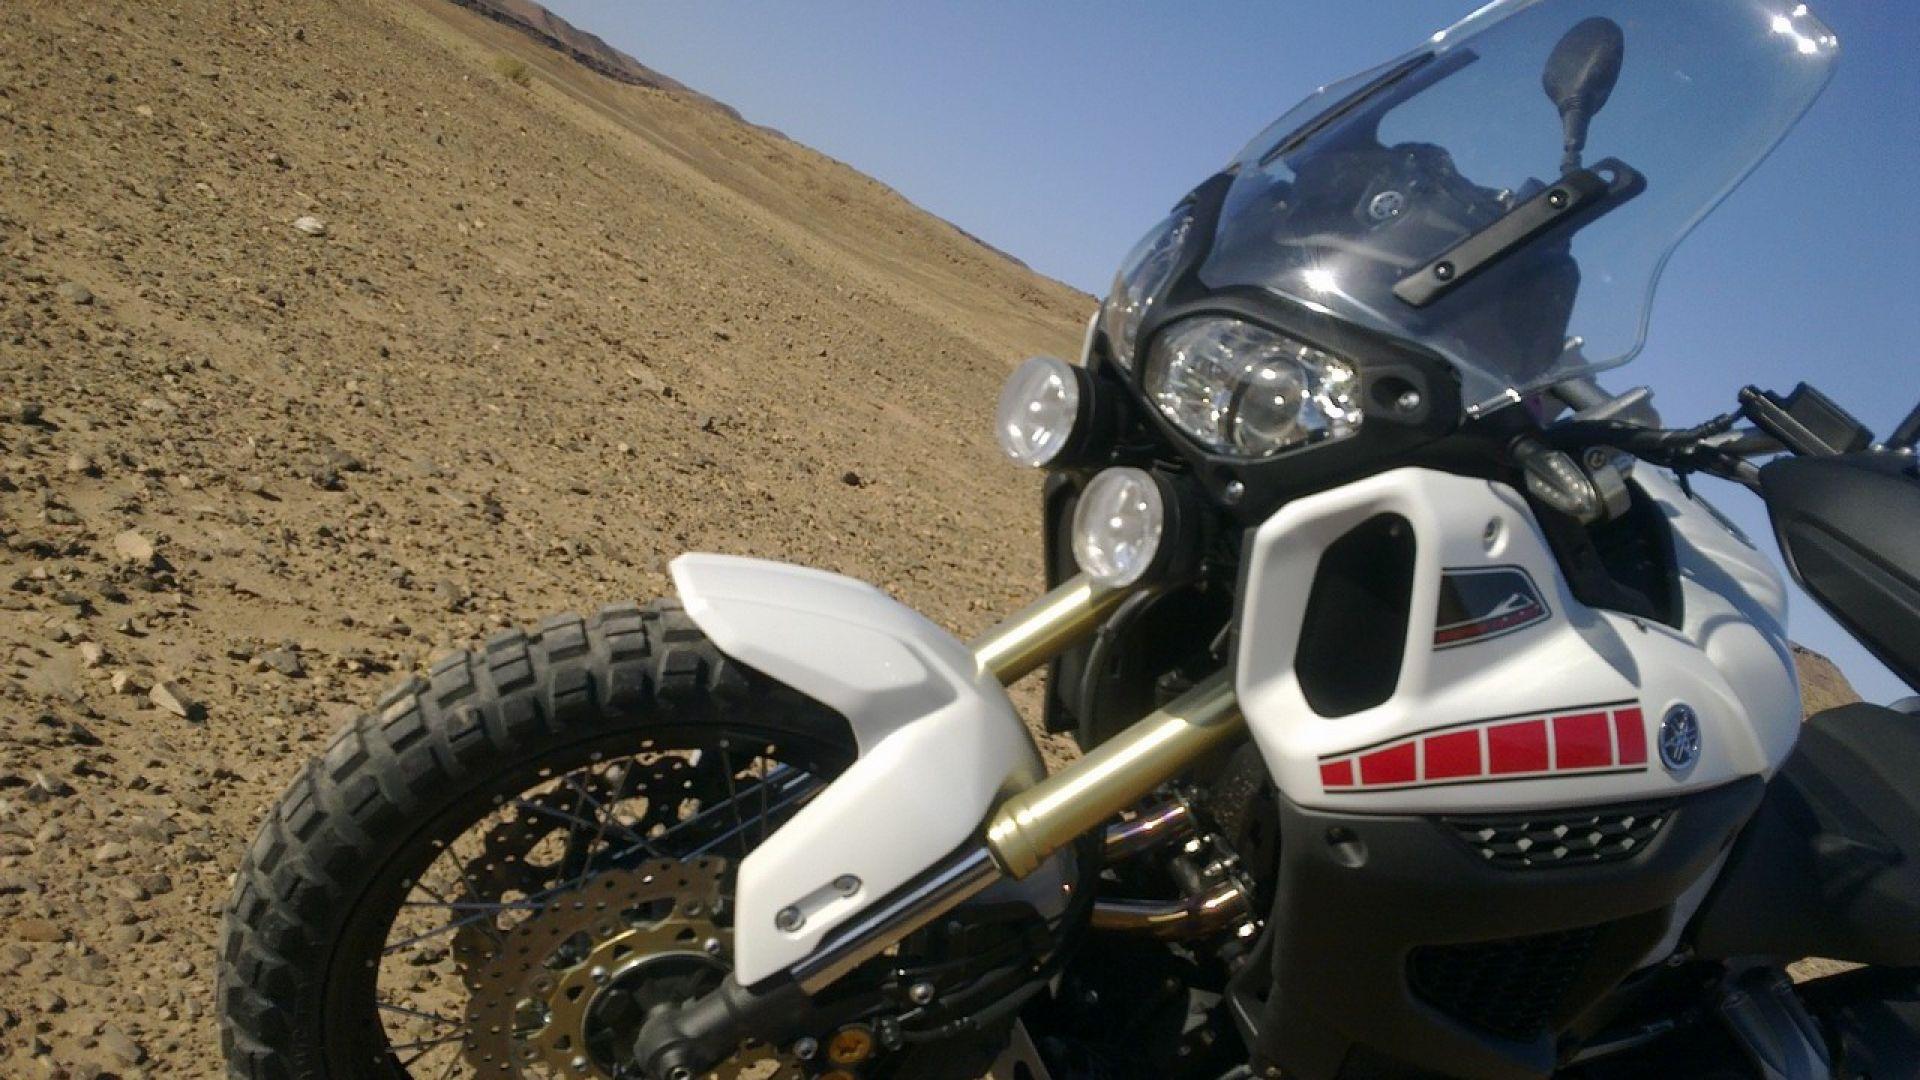 Immagine 186: In Marocco con la Yamaha Super Ténéré